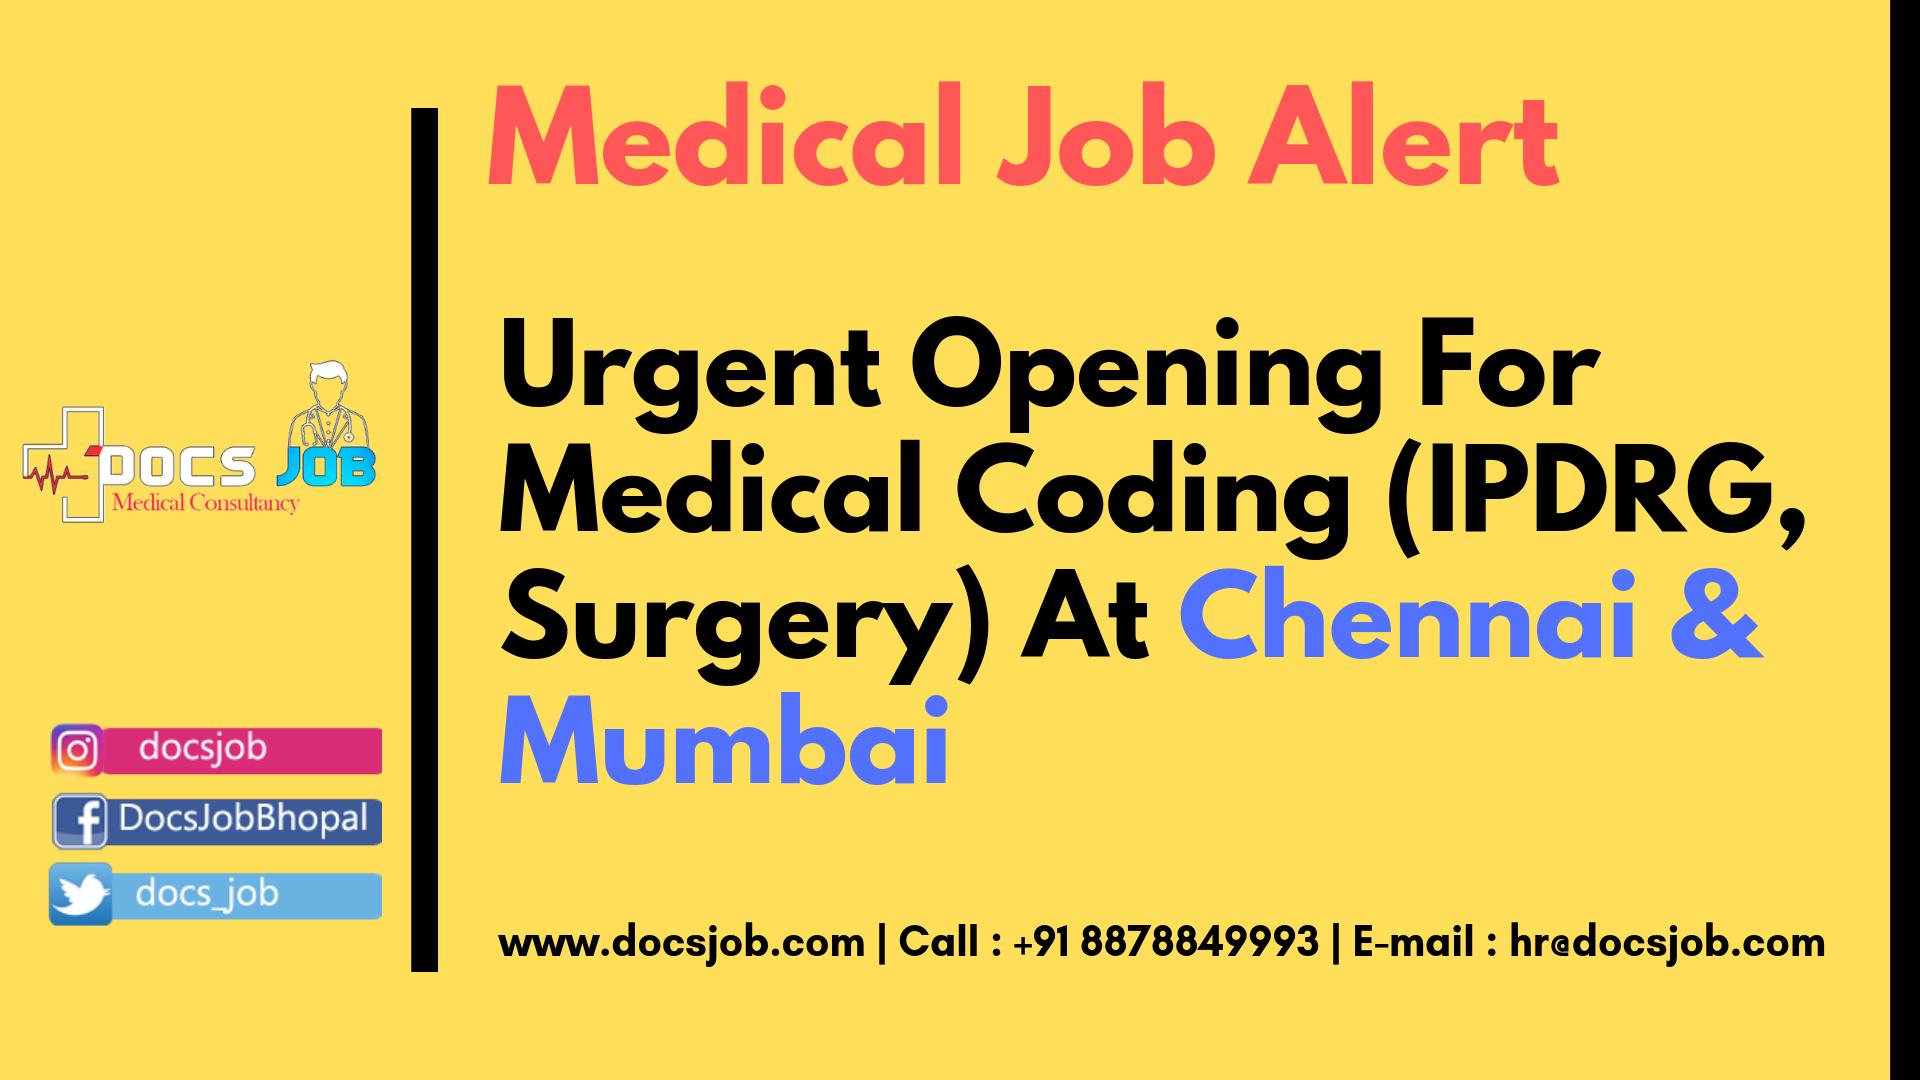 medicaljob doctor medicaljobs indiajobs medical